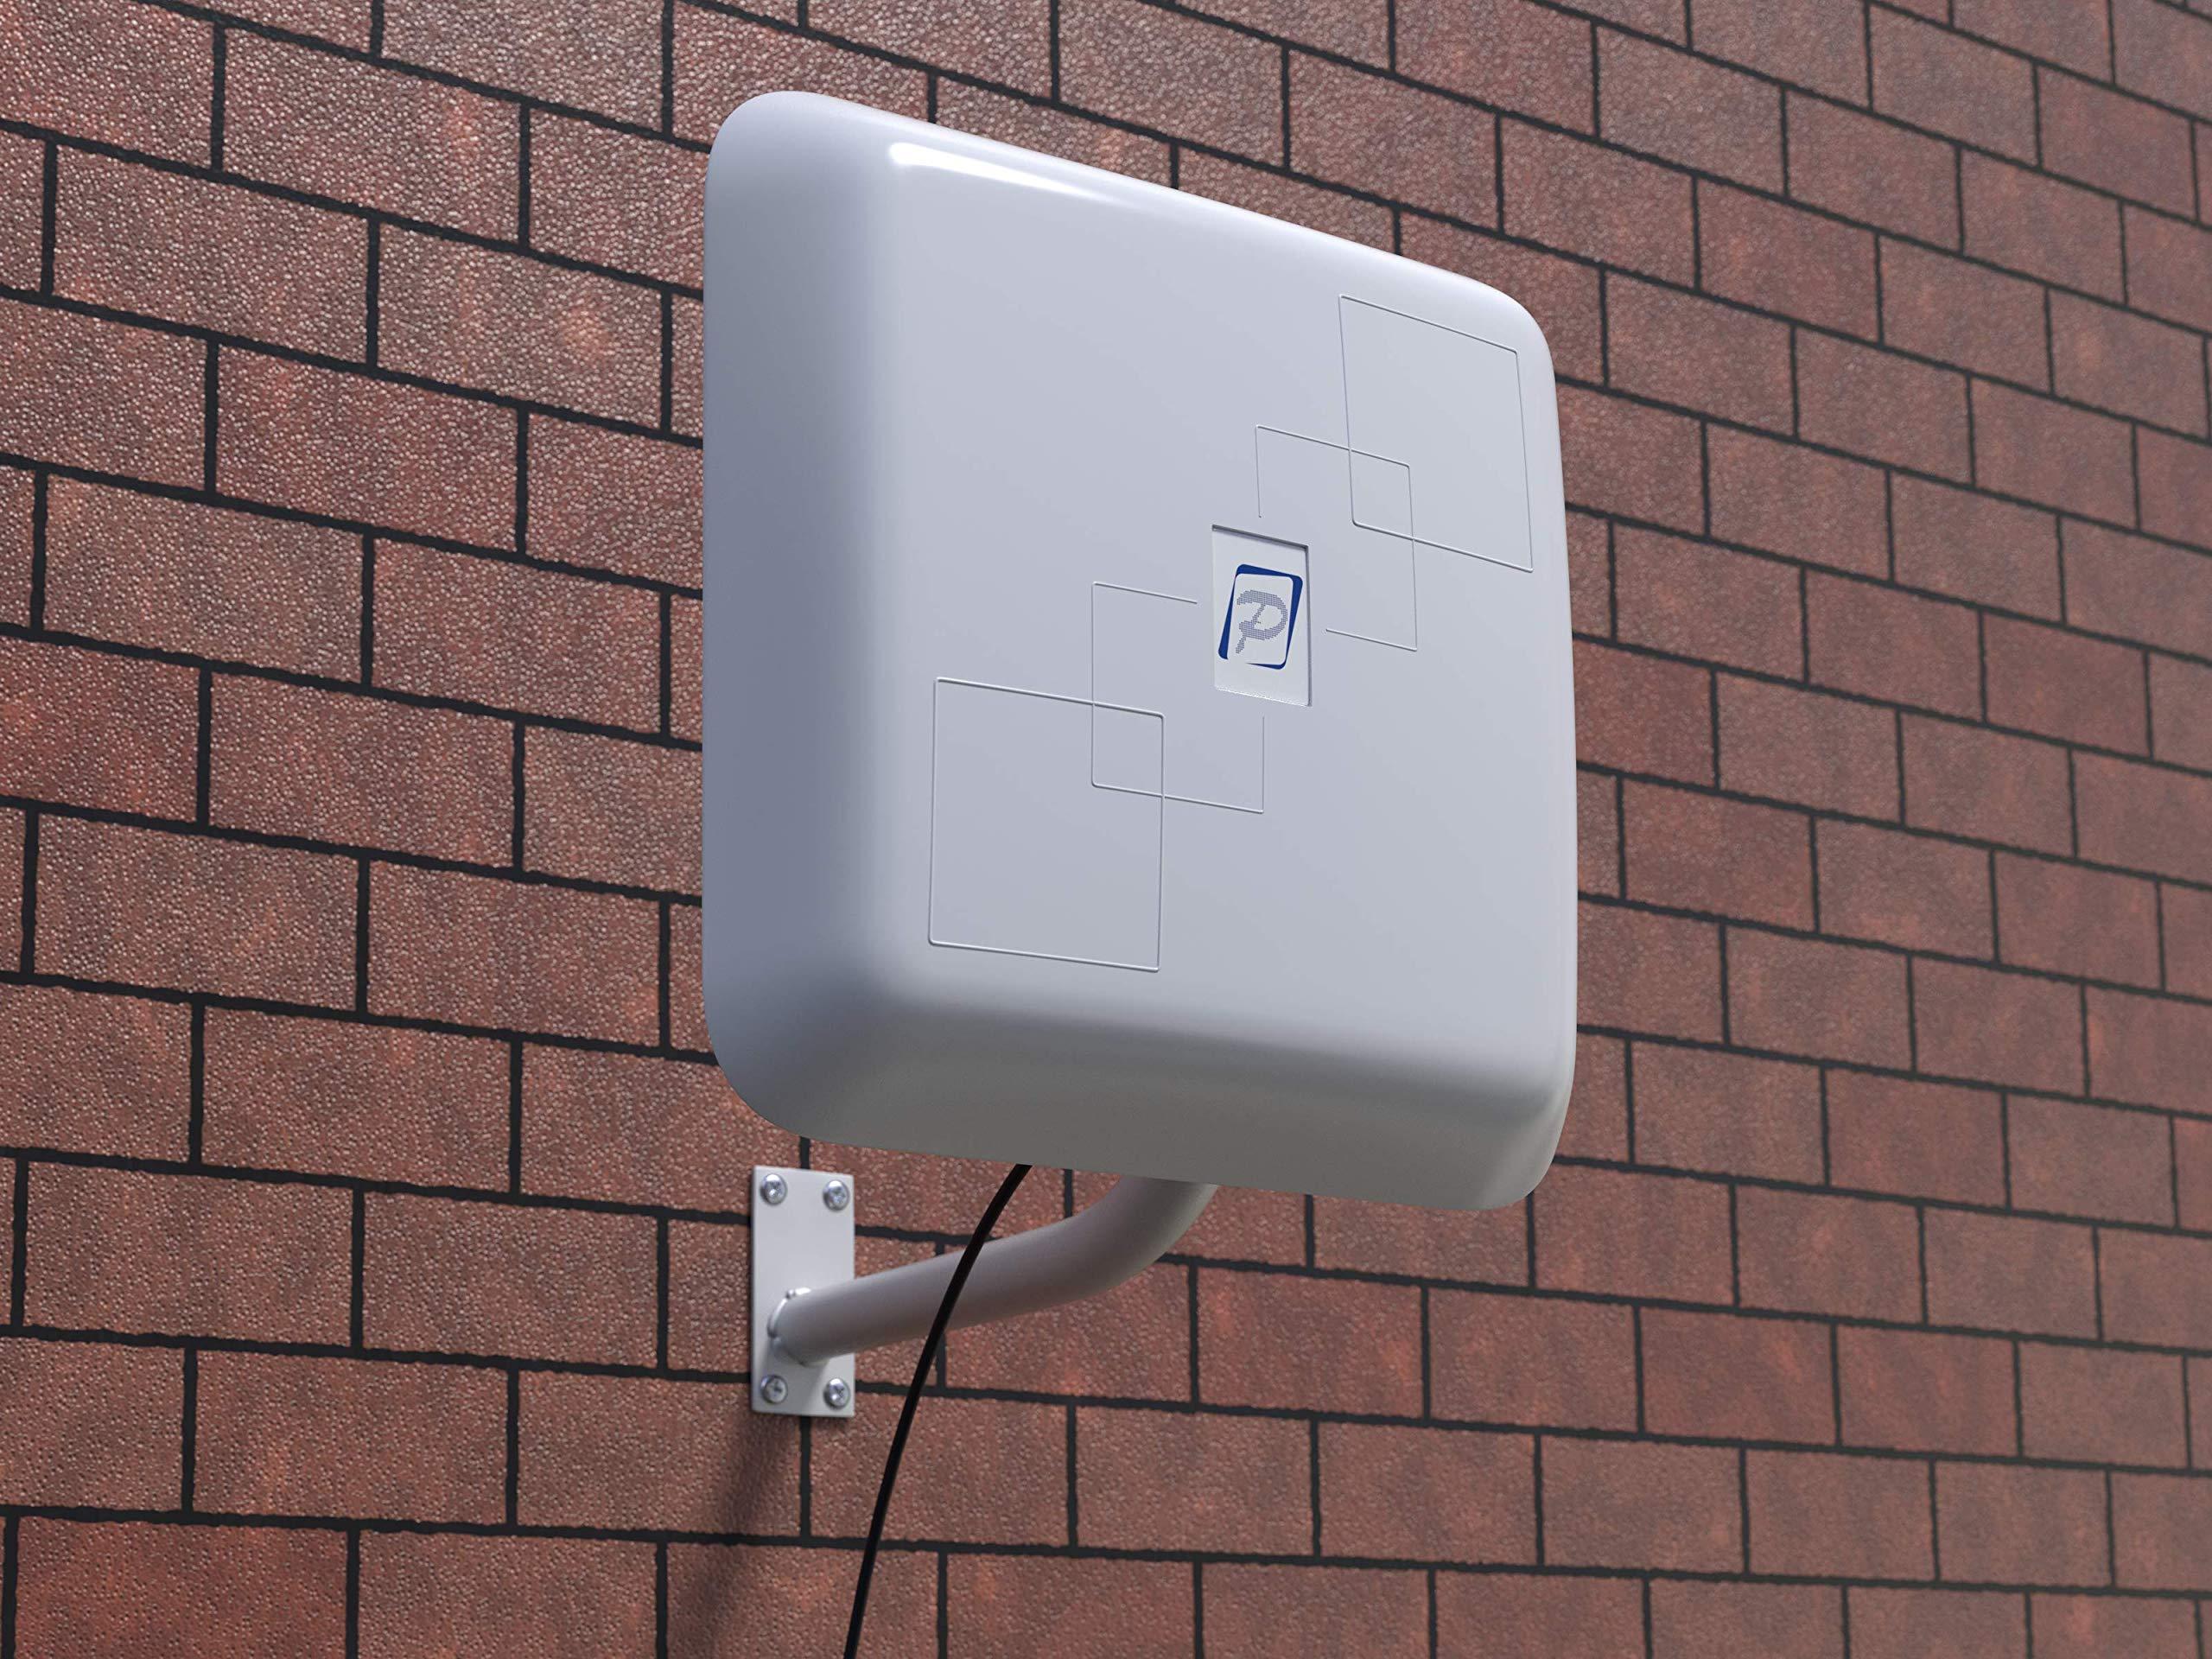 REMO BAS 2301WiFi Outdoor Wireless Connector